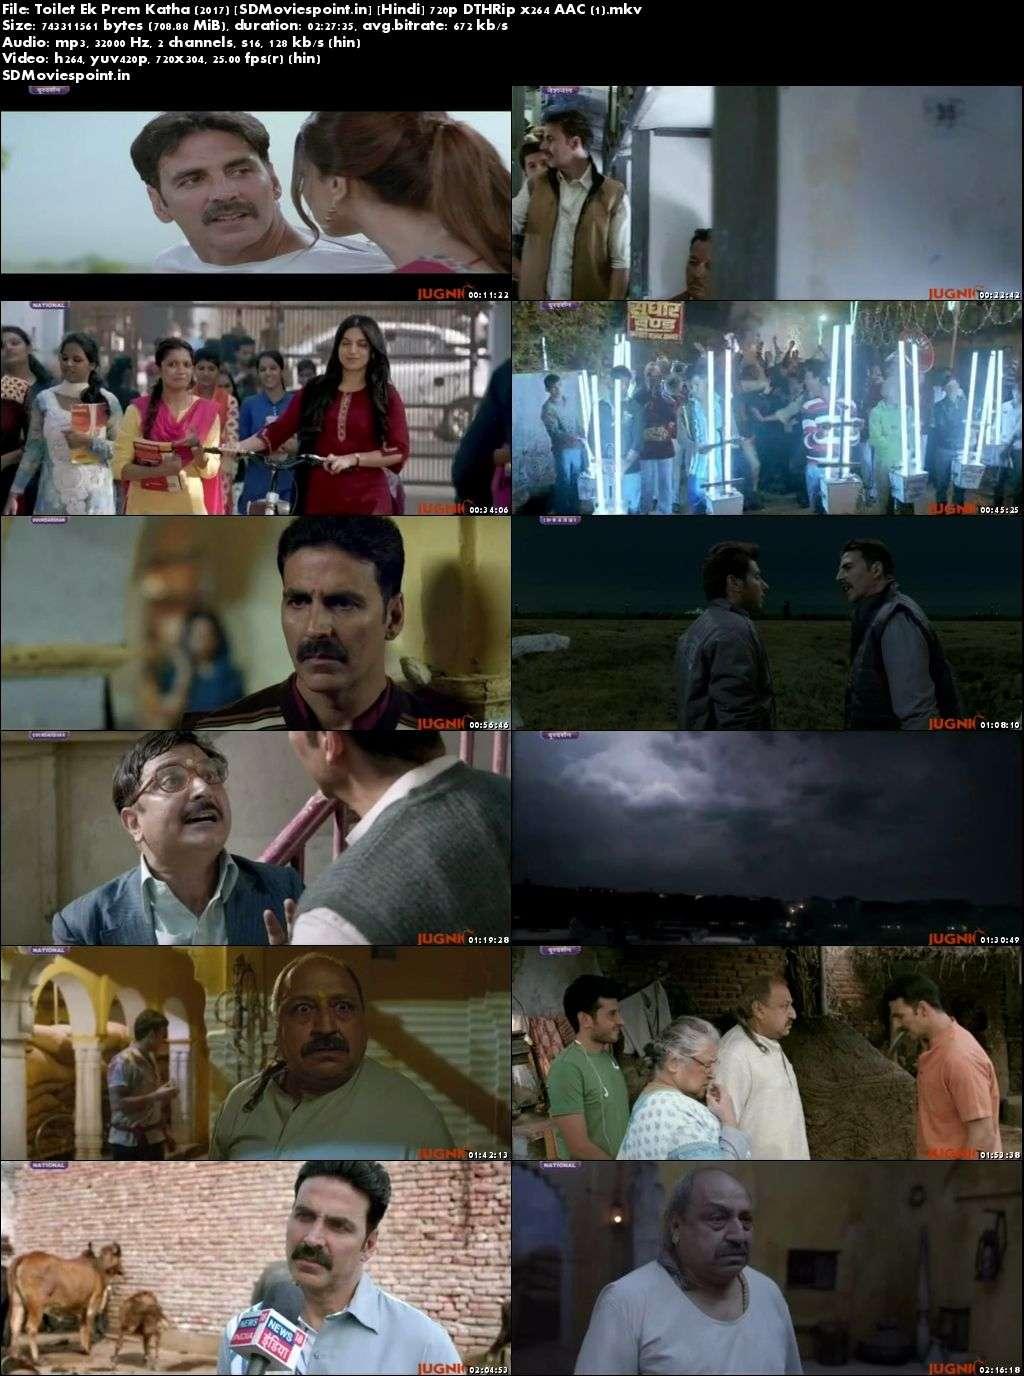 Screen Shots Toilet Ek Prem Katha 2017 Full Hindi Movie Download HD Free 720p